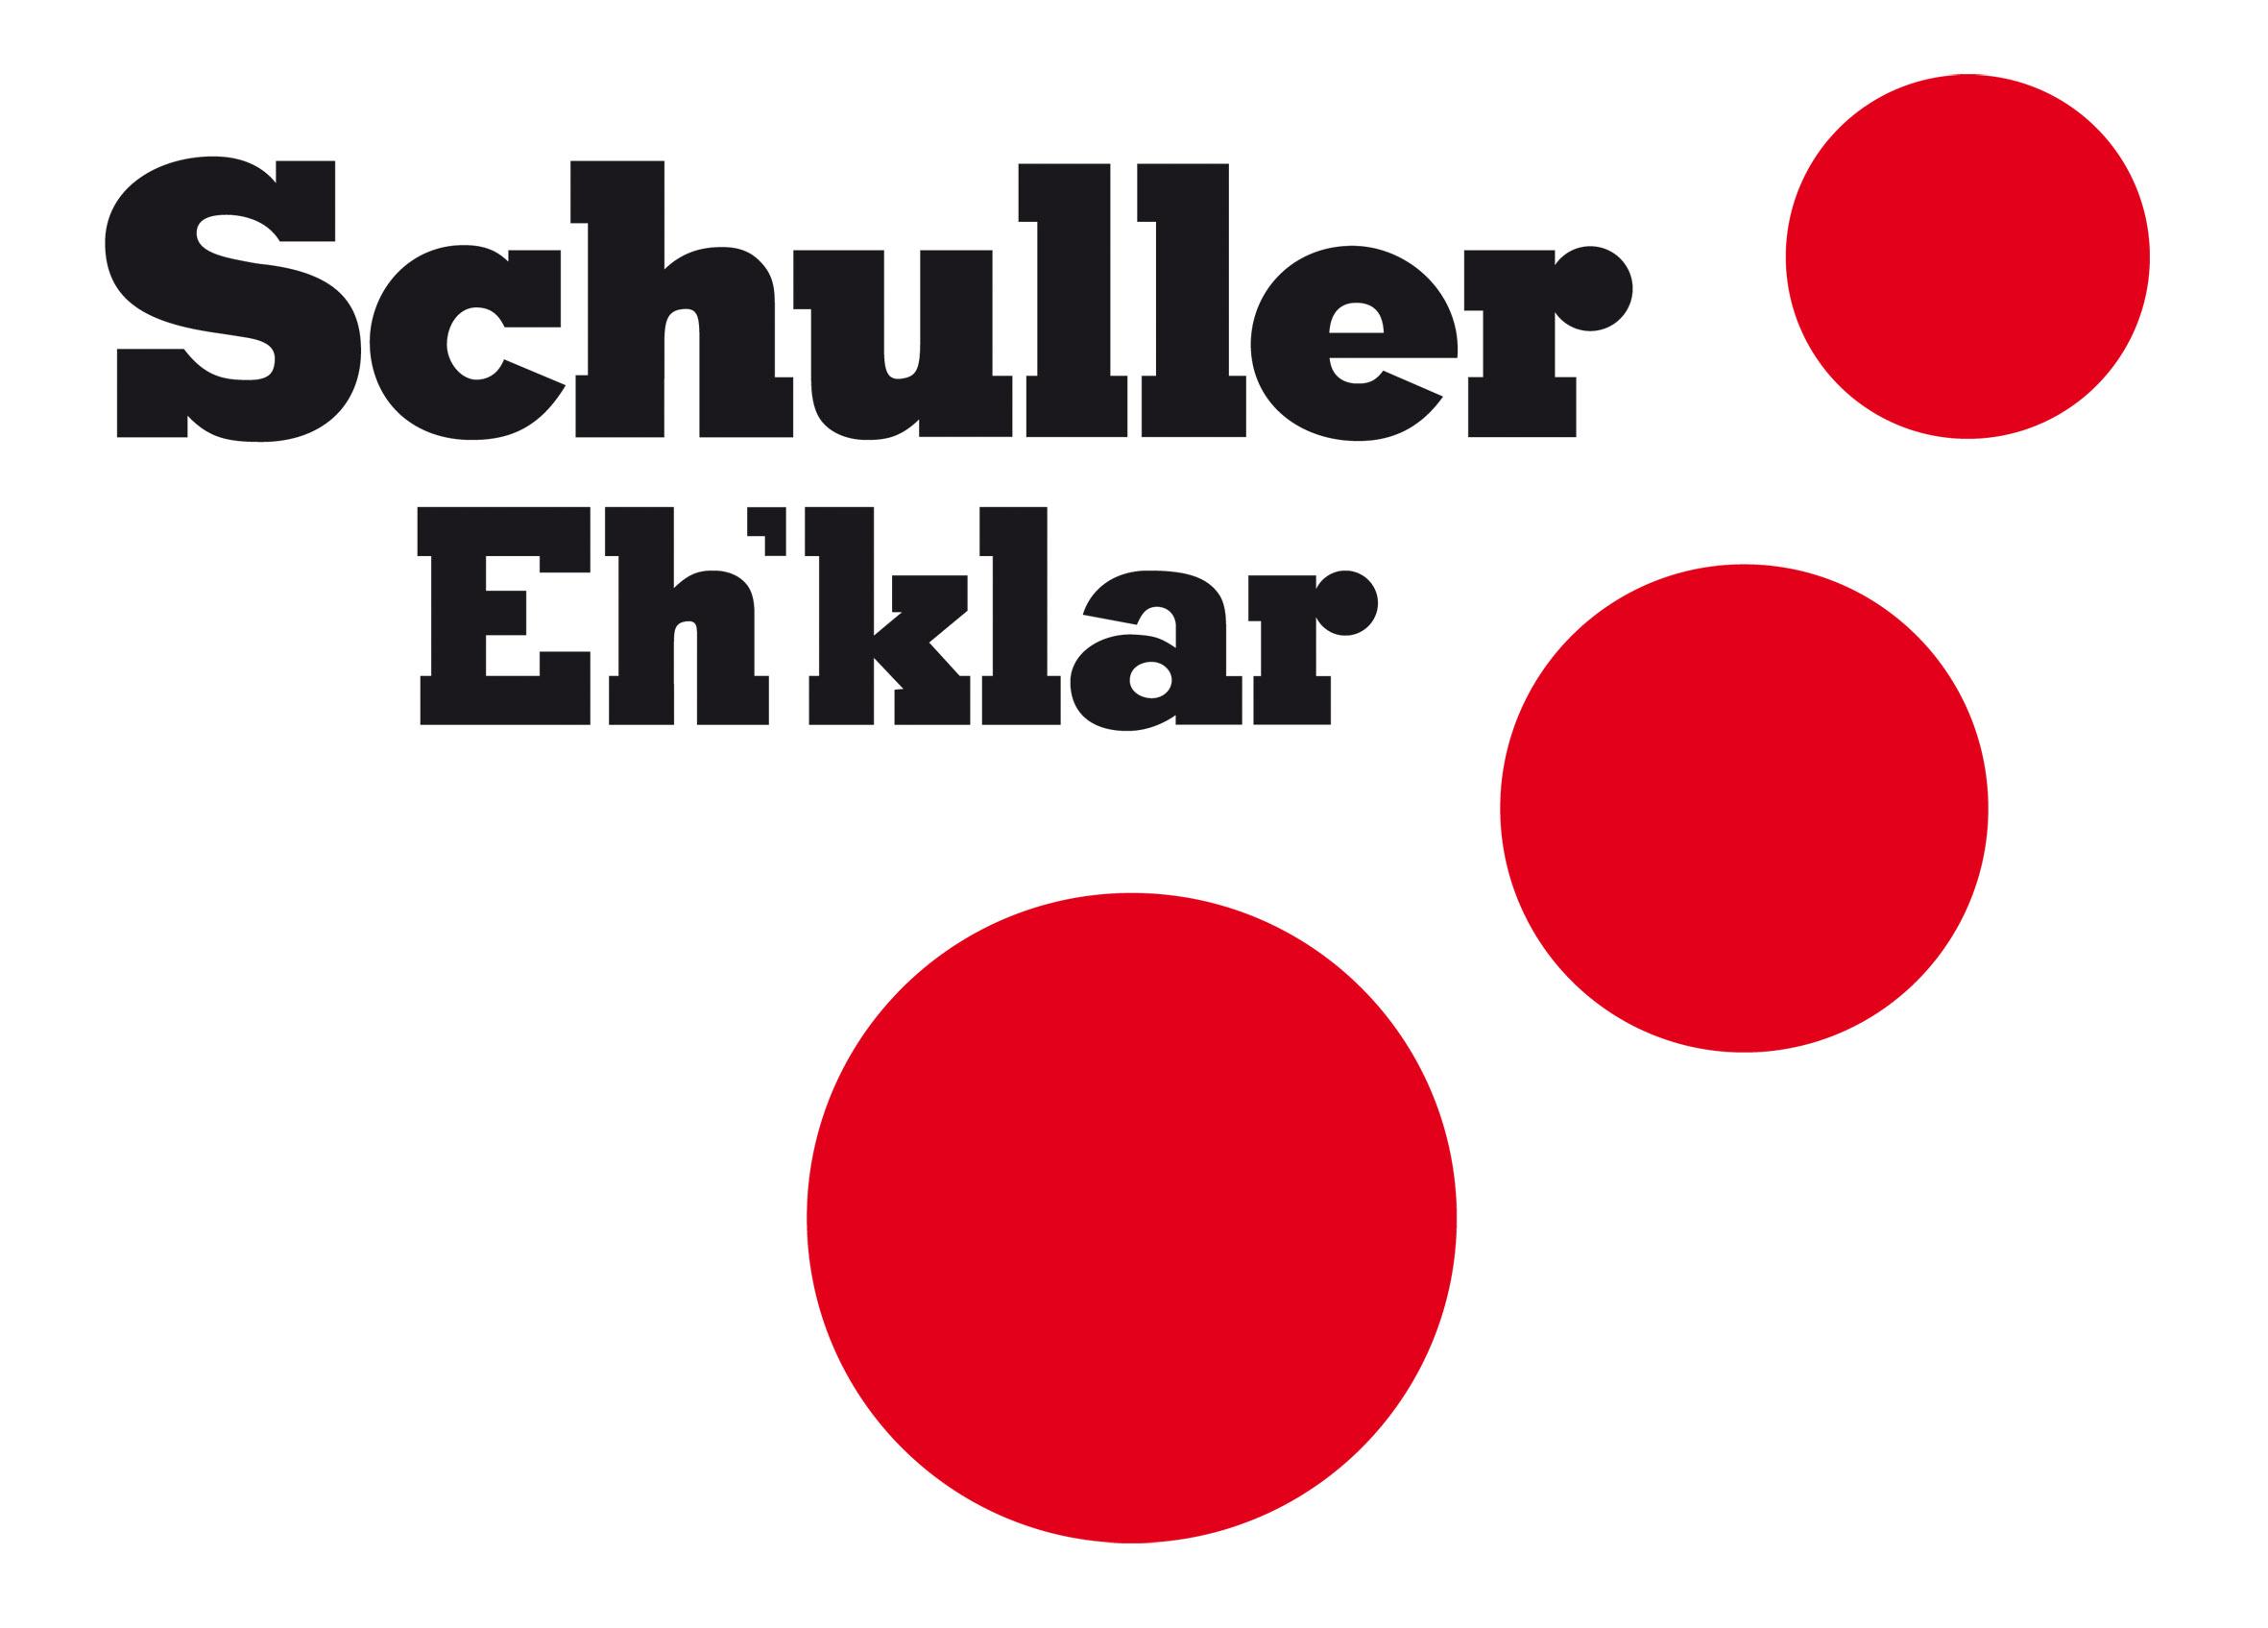 https://u-olimpiacluj.ro/wp-content/uploads/2021/06/Schuller_eh_Klar_Logo_RGB.jpg